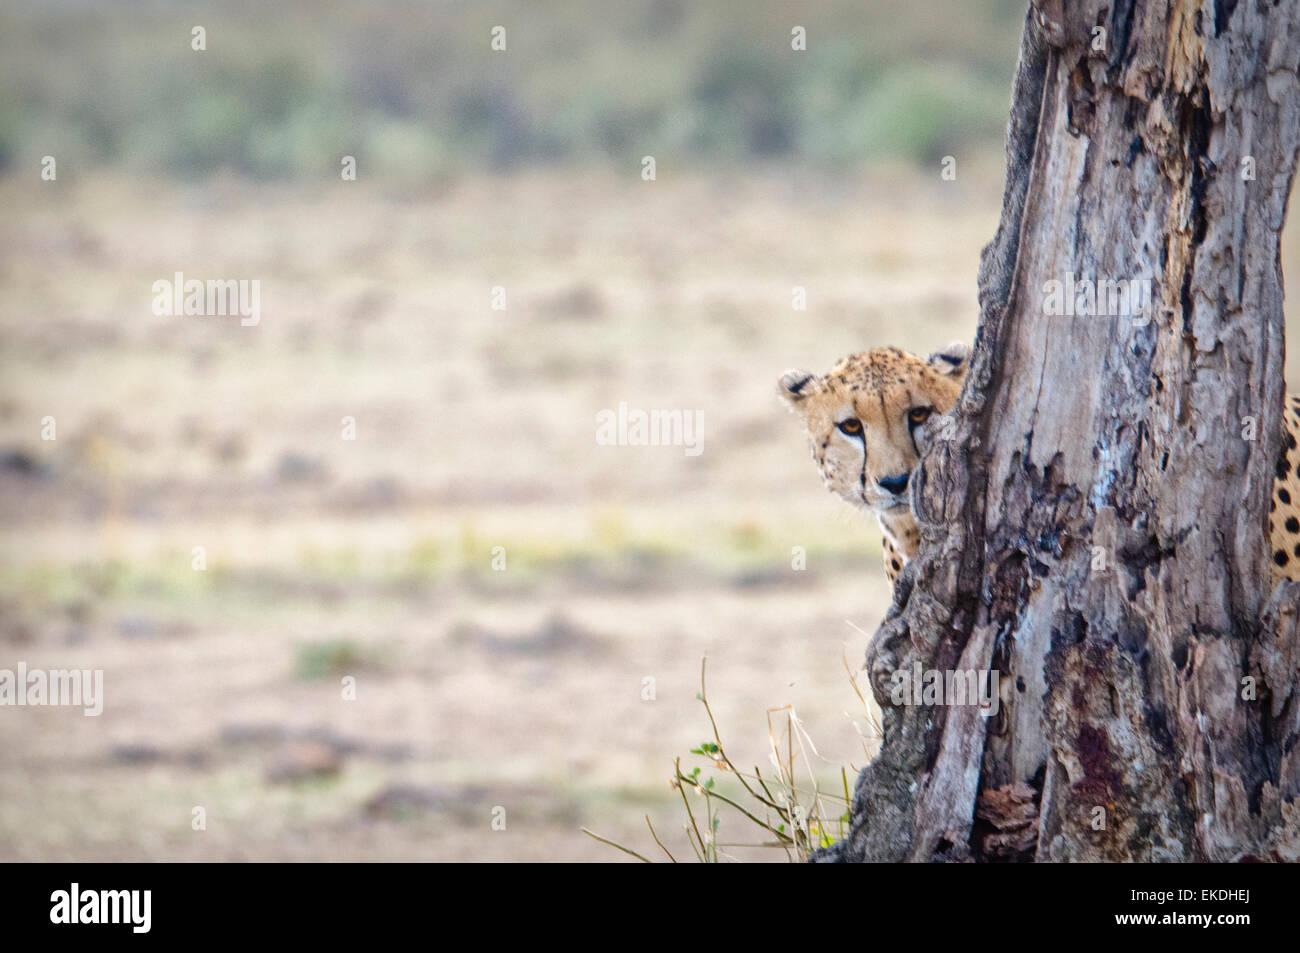 Young Cheetah,  Acinonyx  jubatus, hiding and peeking from behind a tree in the Masai Mara, Kenya, East Africa Stock Photo